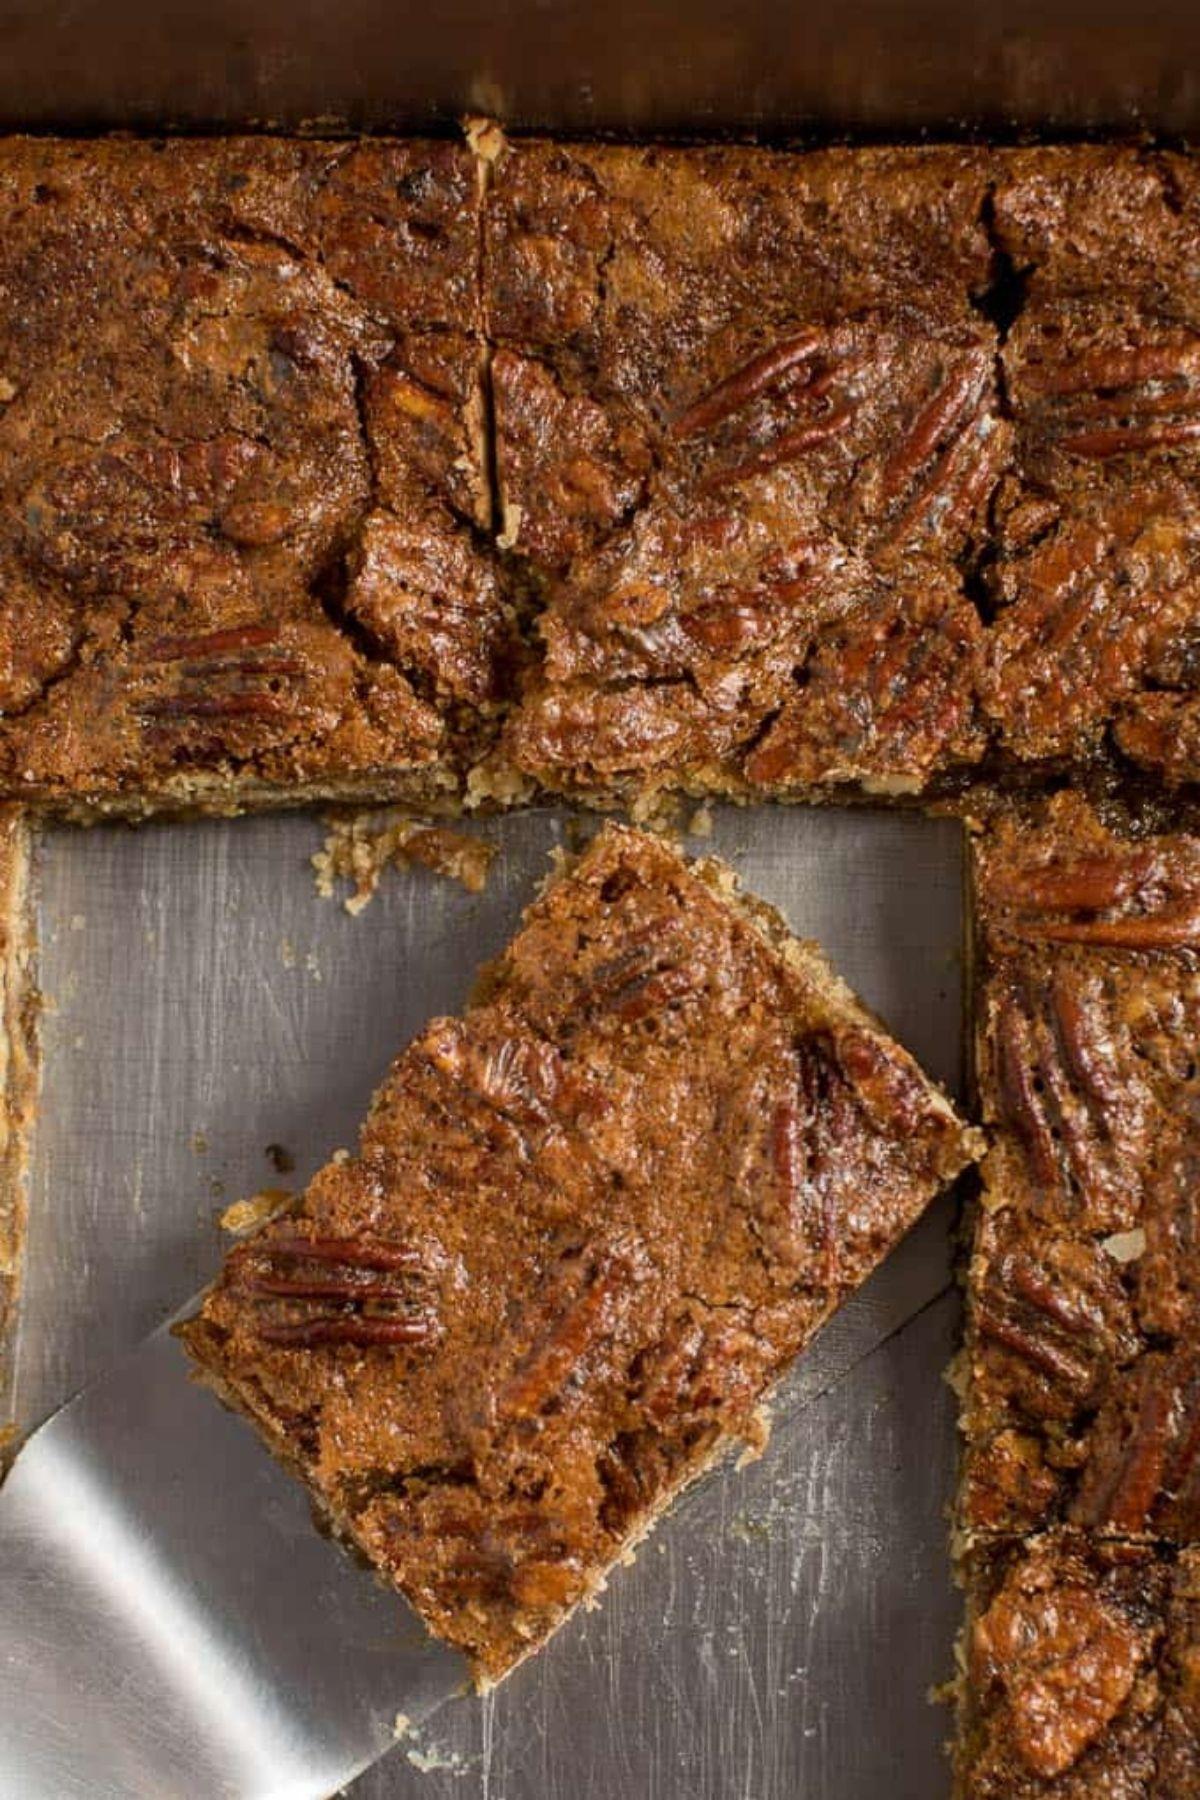 Brownies in baking dish